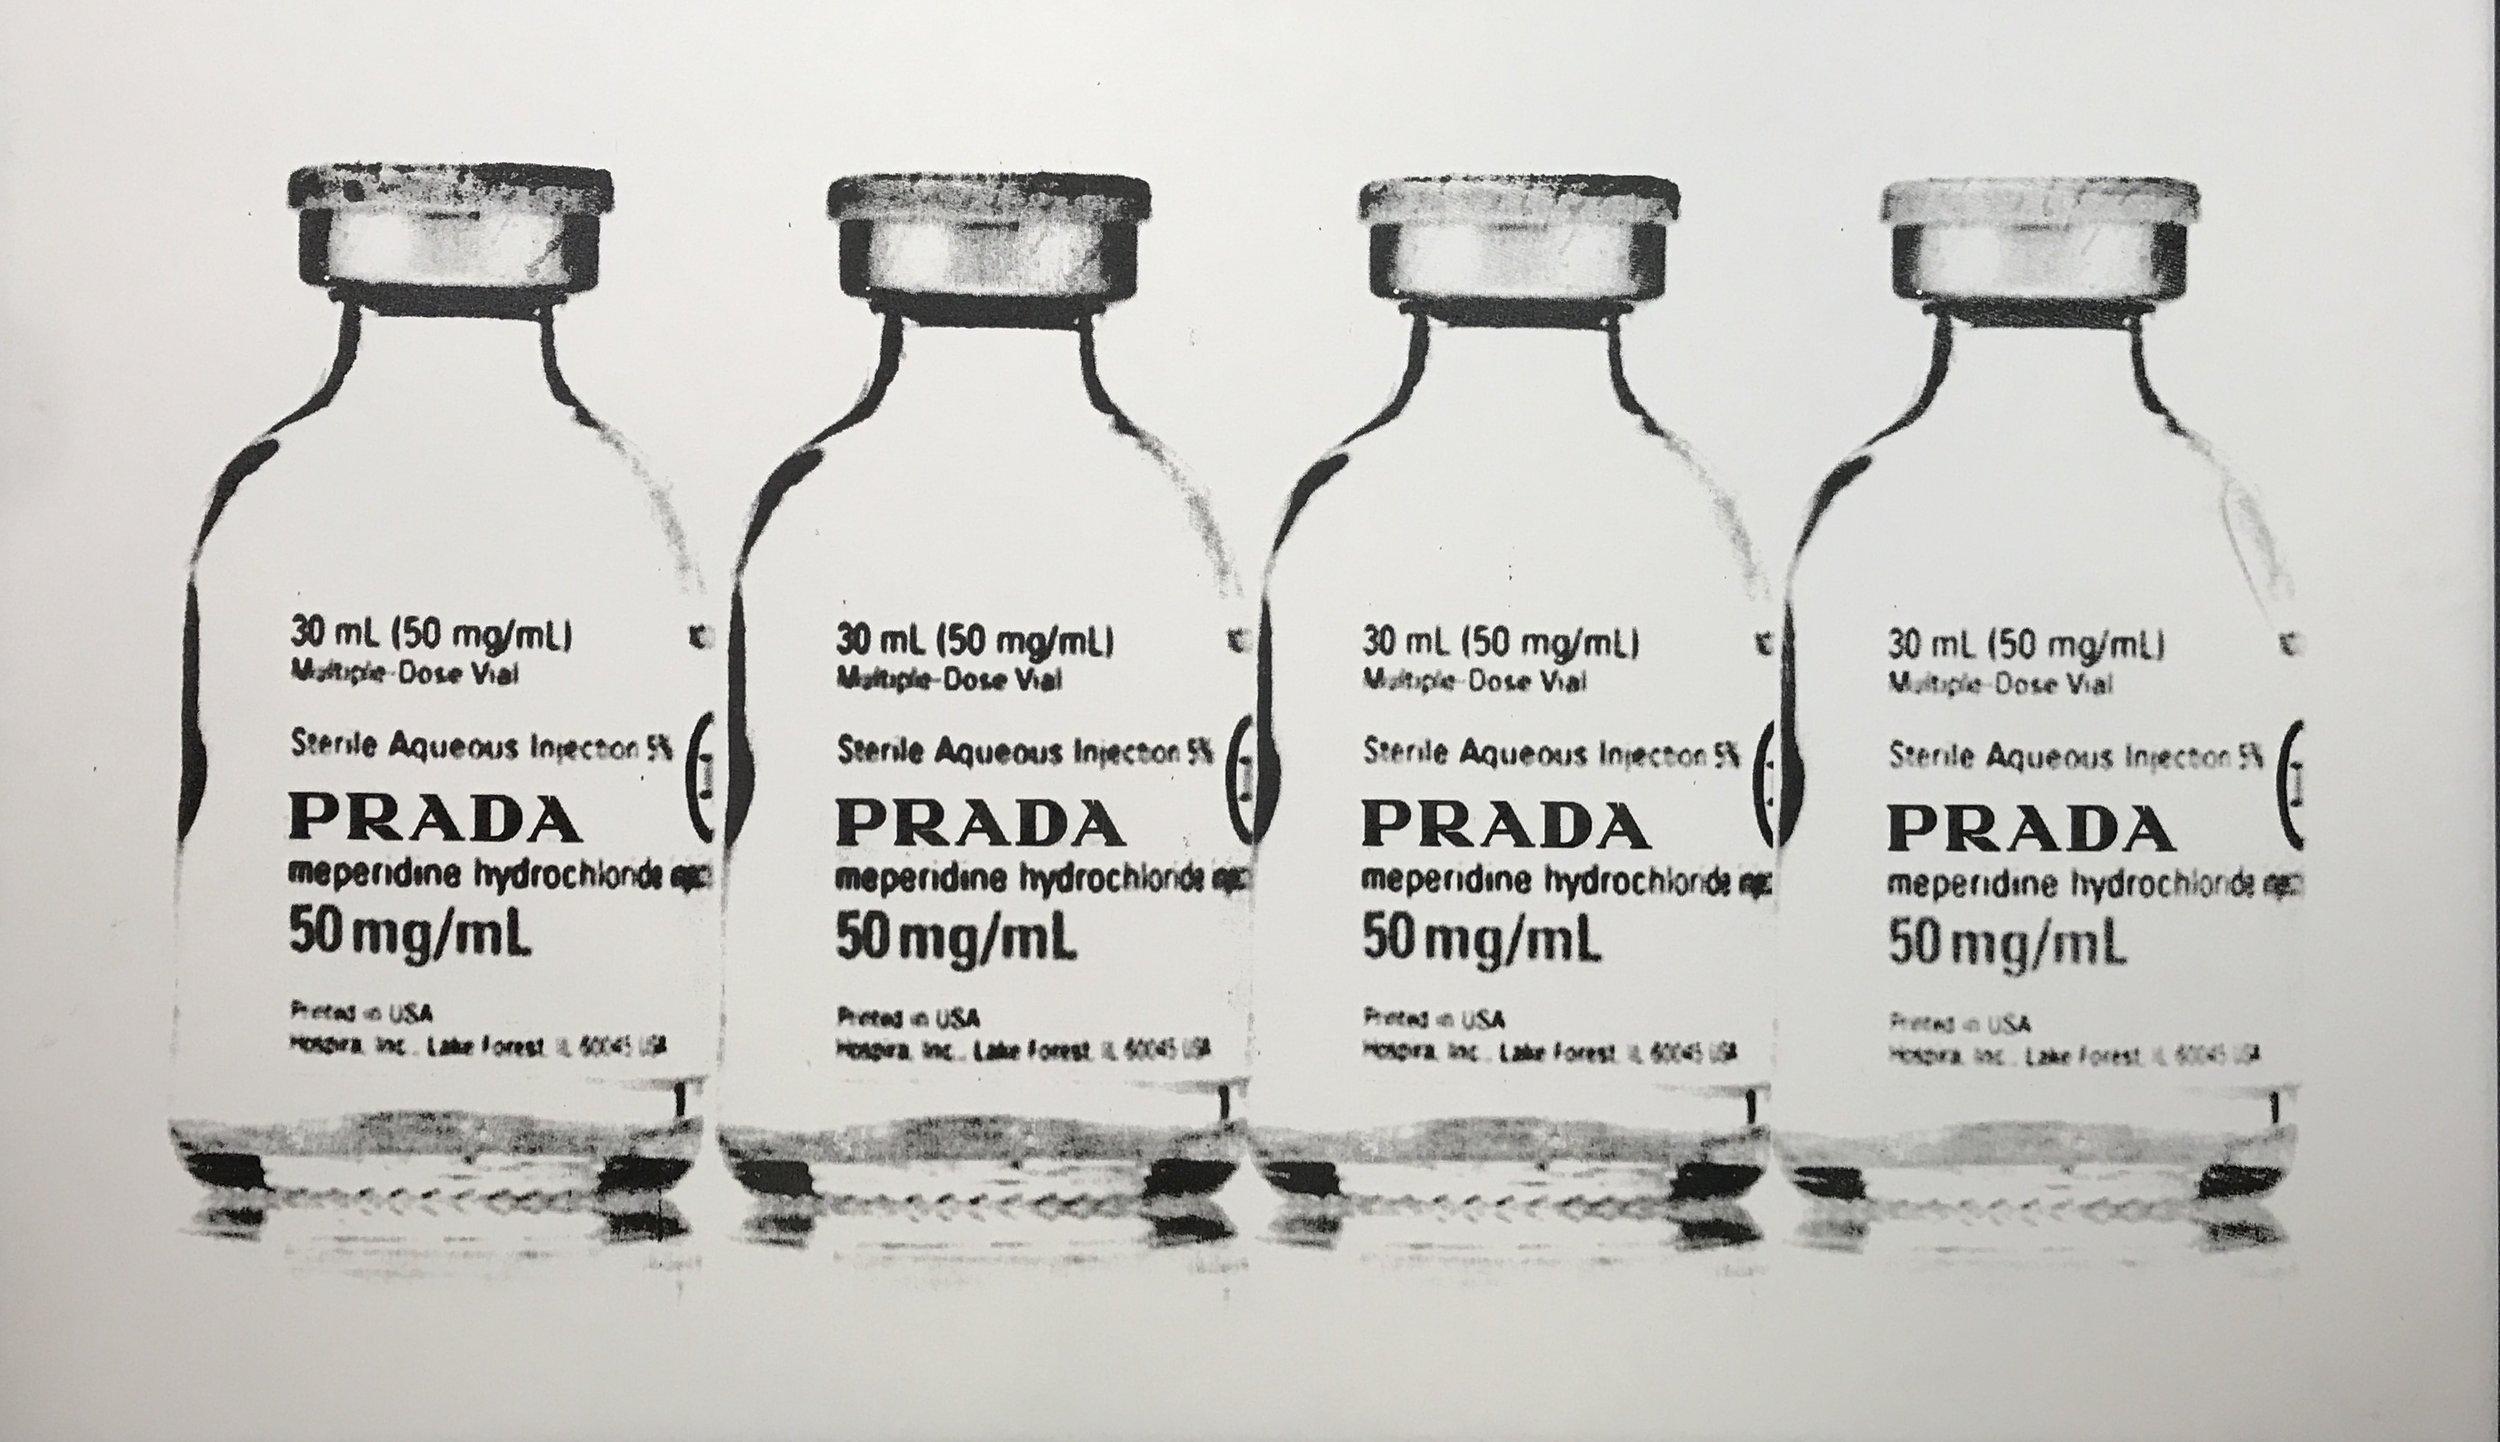 overdose 1/1 - 52 x 30.5 Acrylic on Canvas, Jul '17SOLD